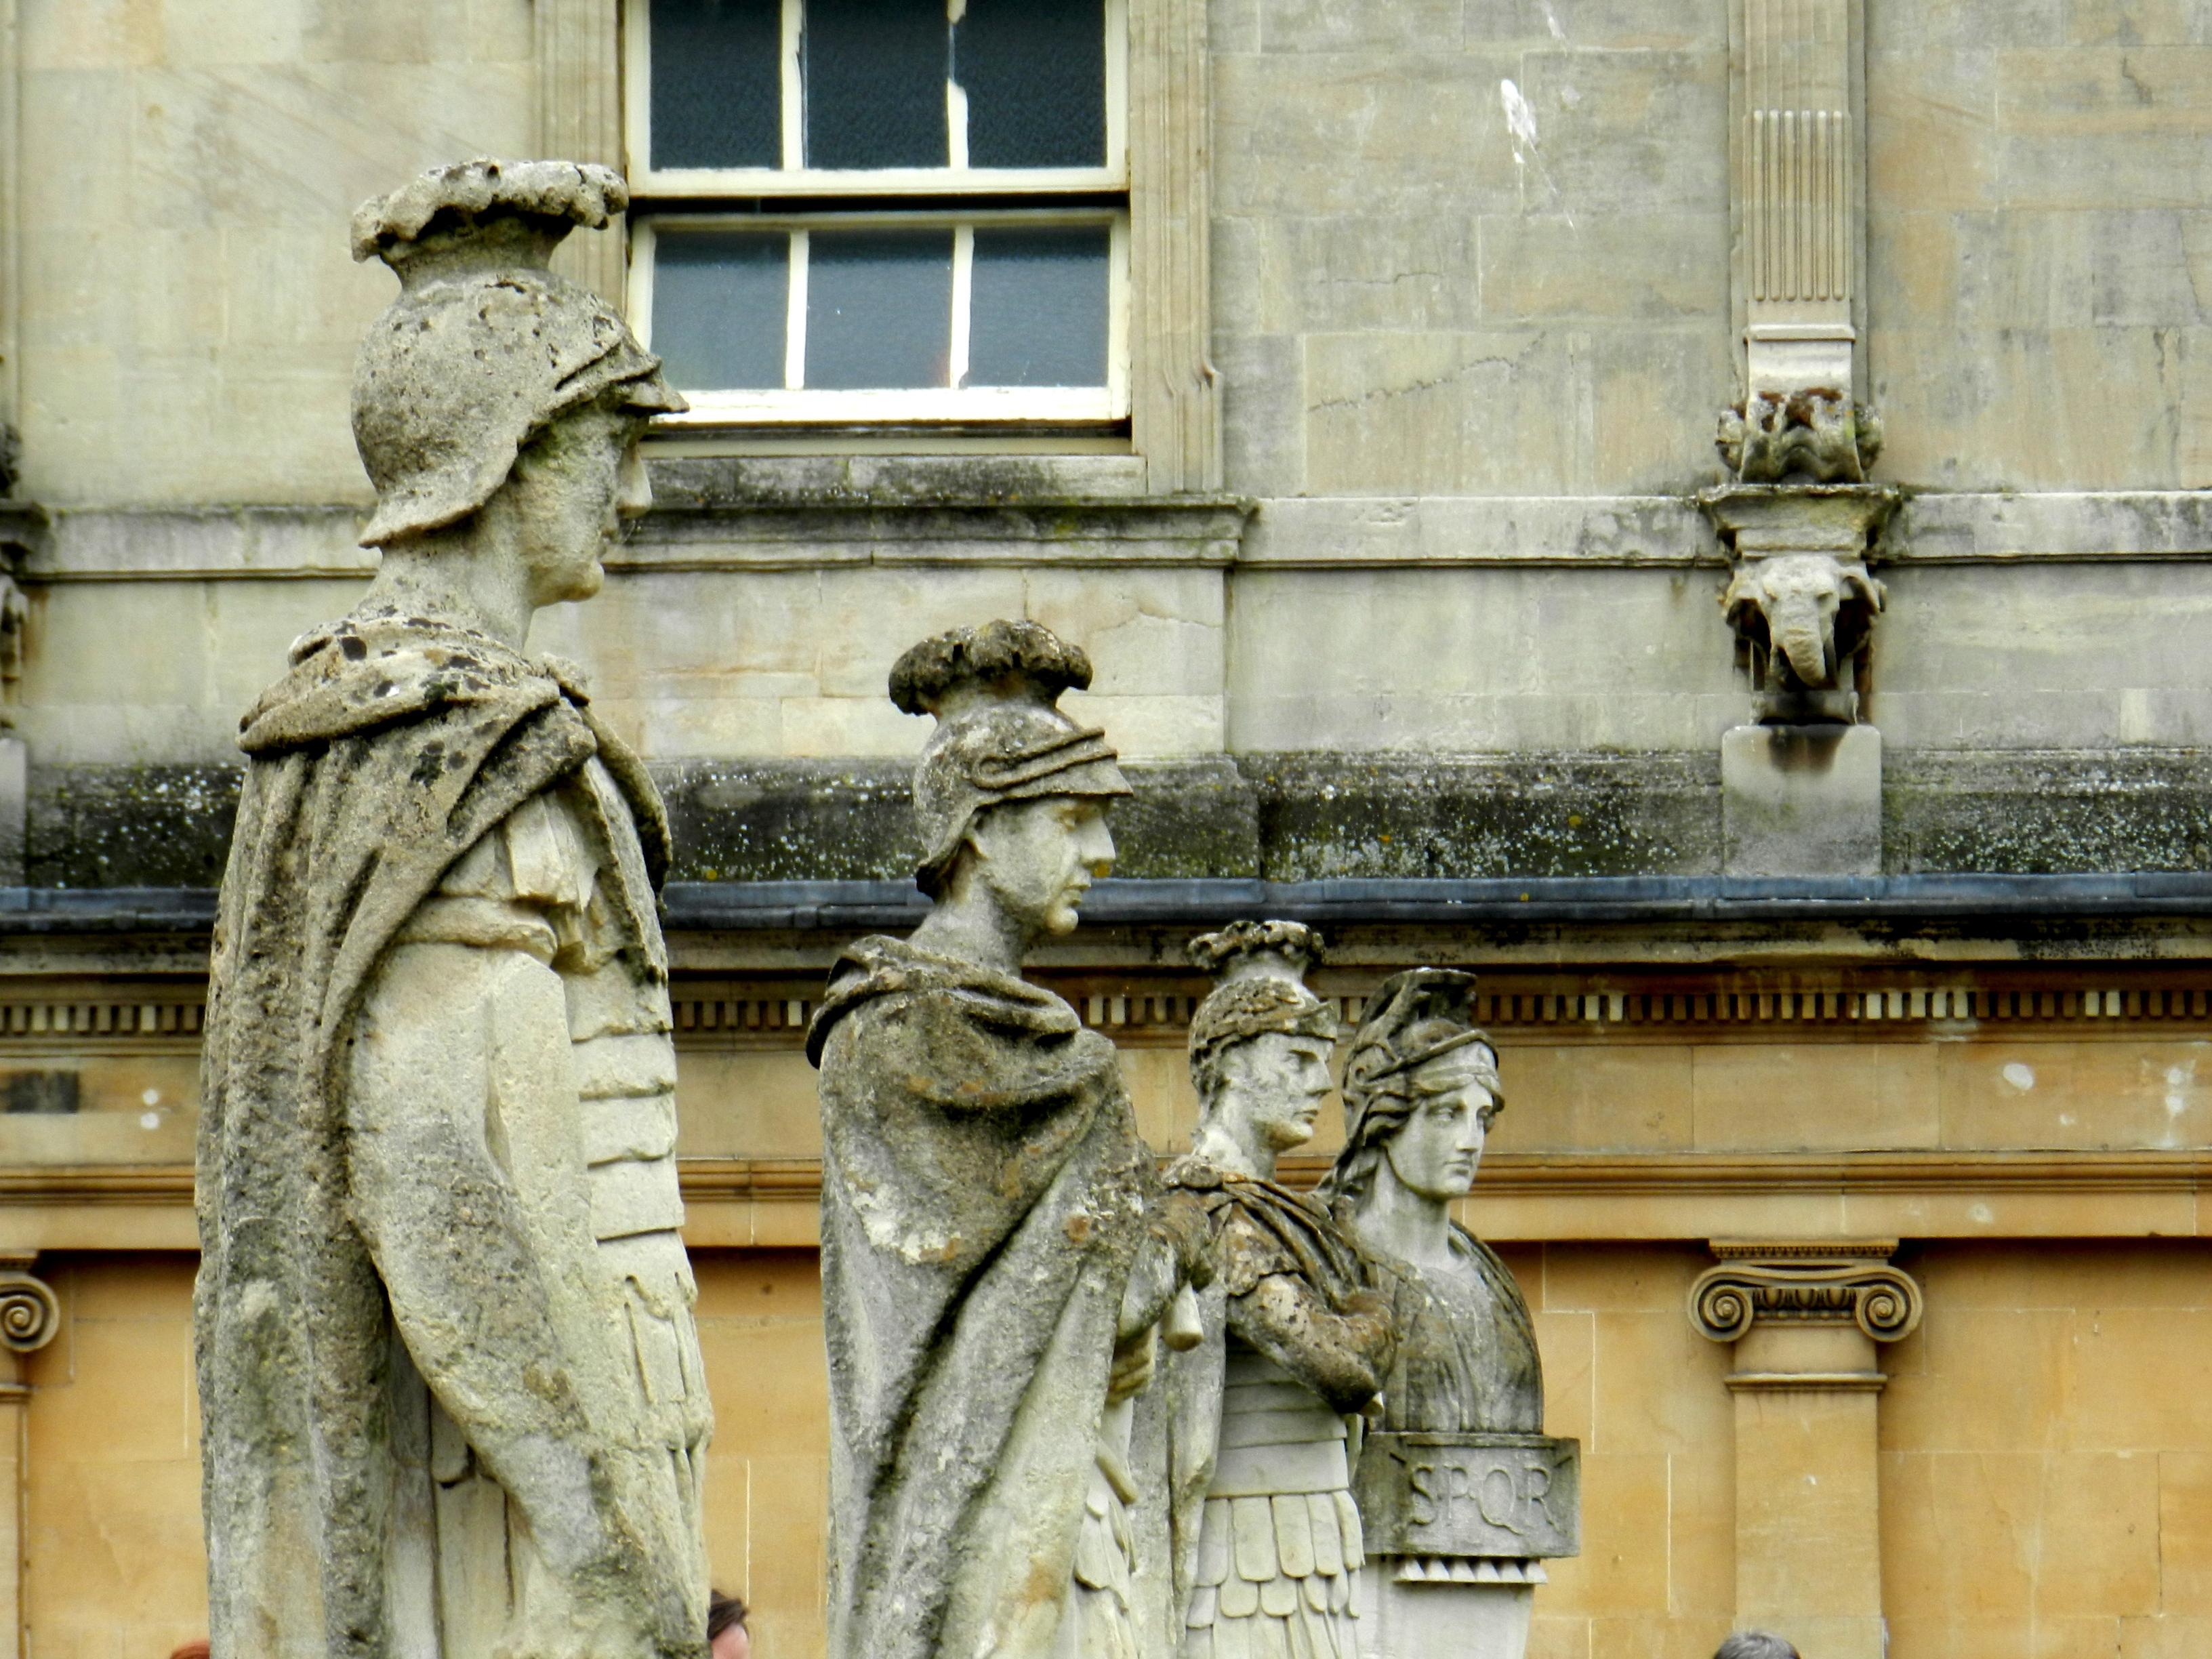 File:Sculptures, bains romains à Bath.JPG - Wikimedia Commons